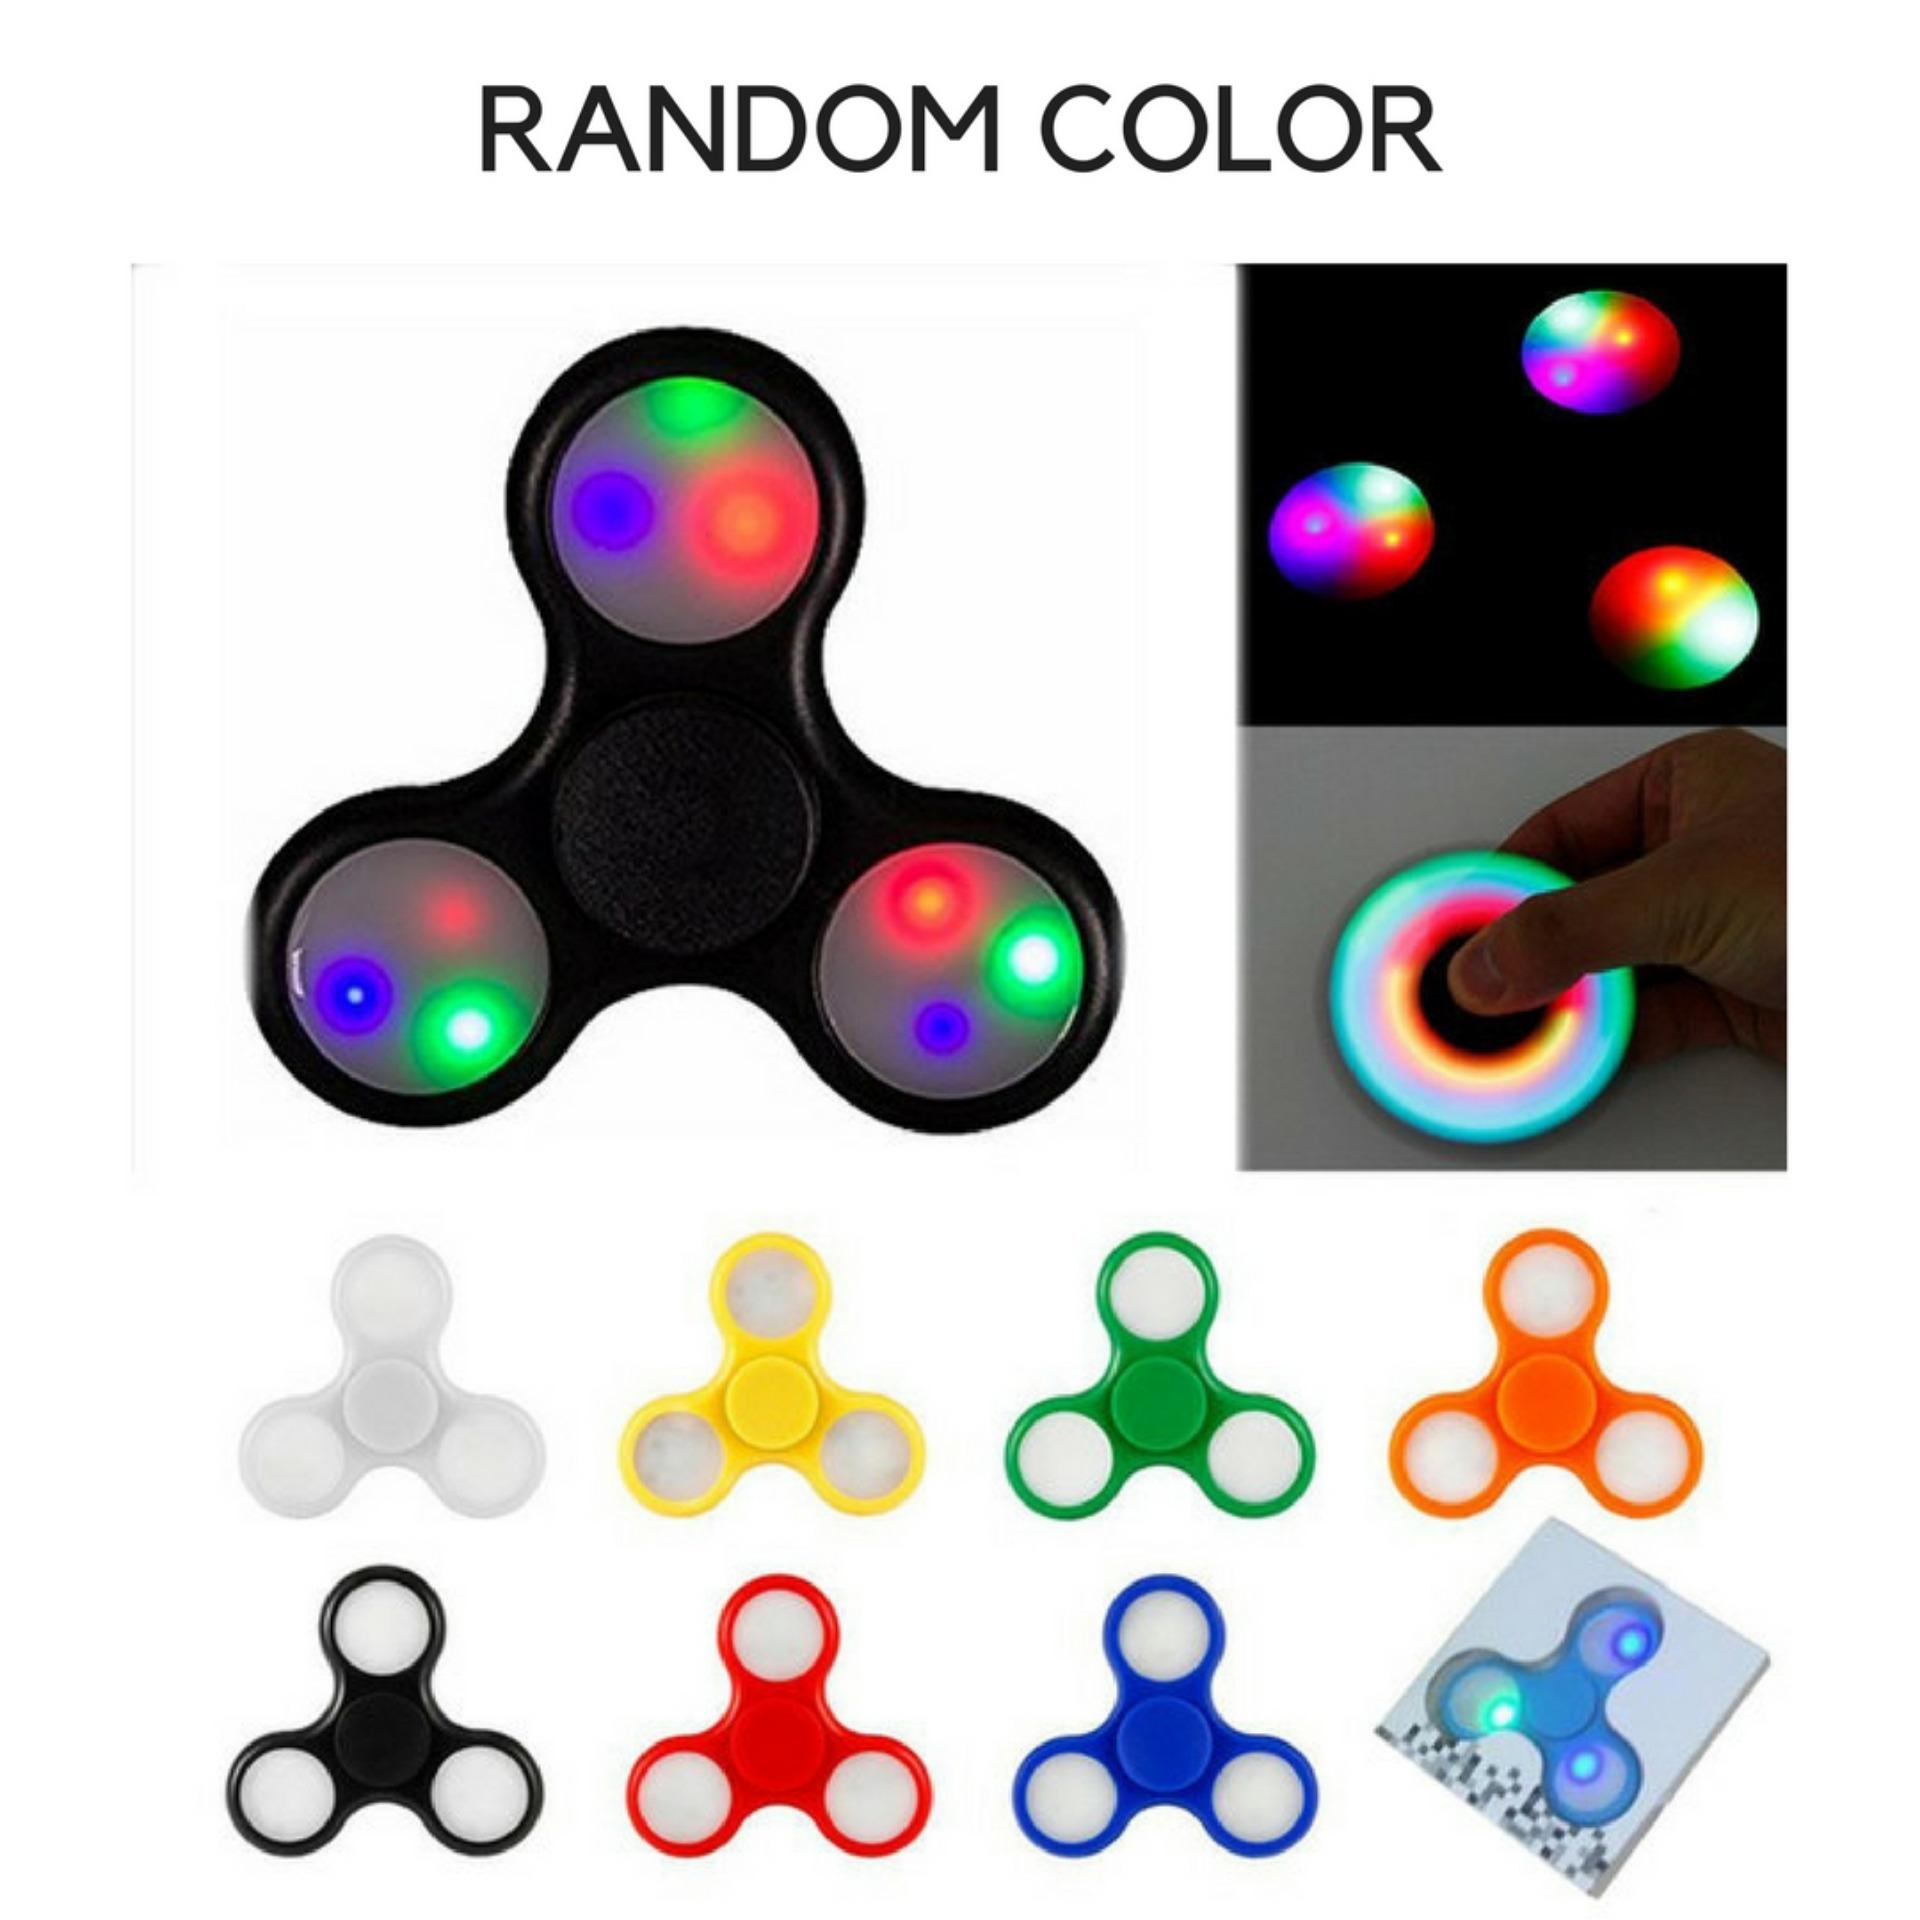 Fidget Spinner Led Light Hand Toys Mainan Jari Tri Edc Ball Aimons With Focus Games Tangan Random Colour Game